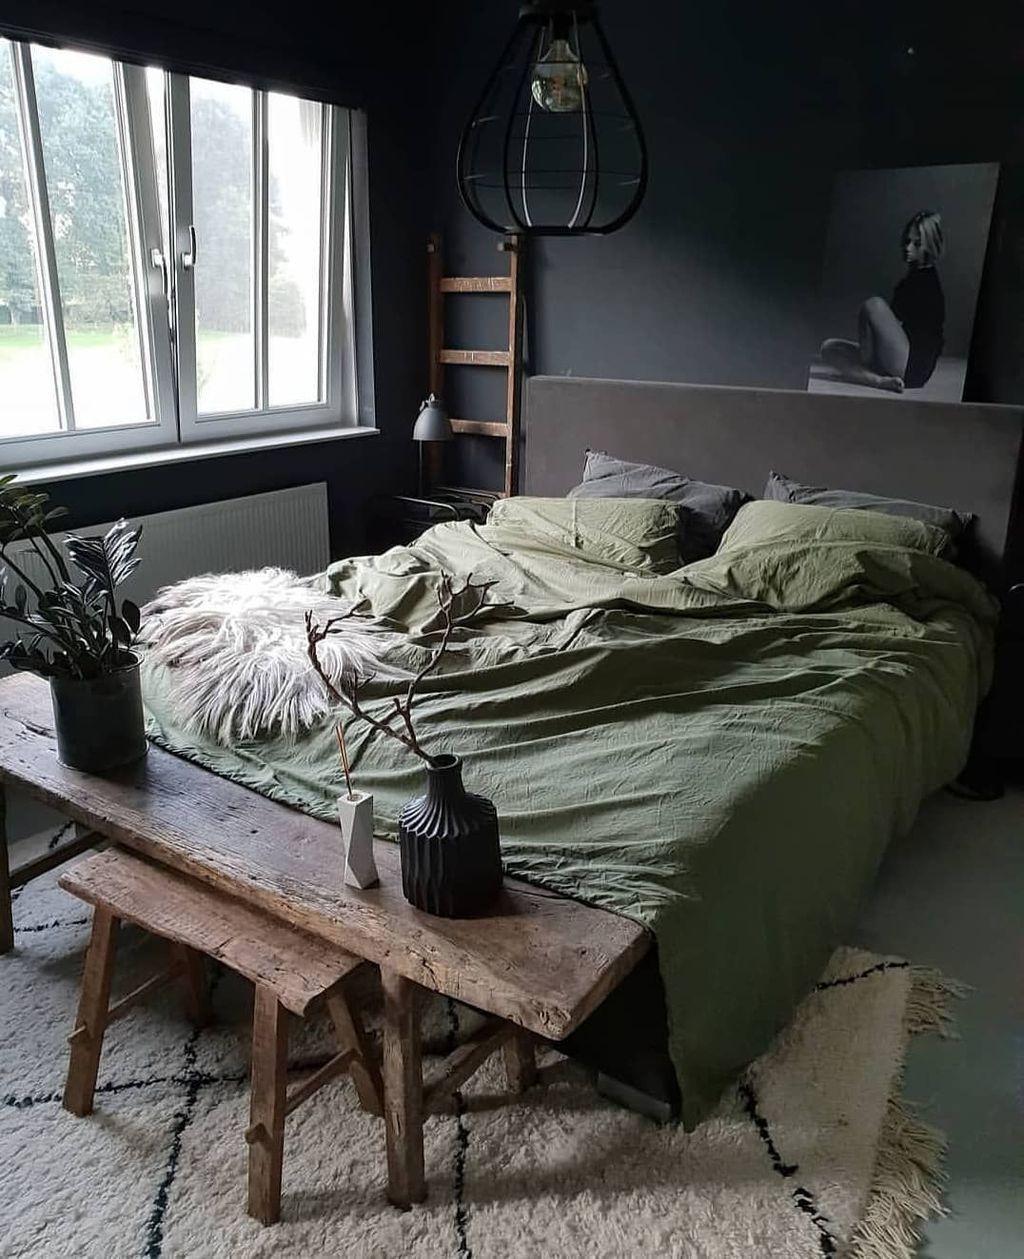 Gentlemen, when you decide to decorate your bedroom surely you